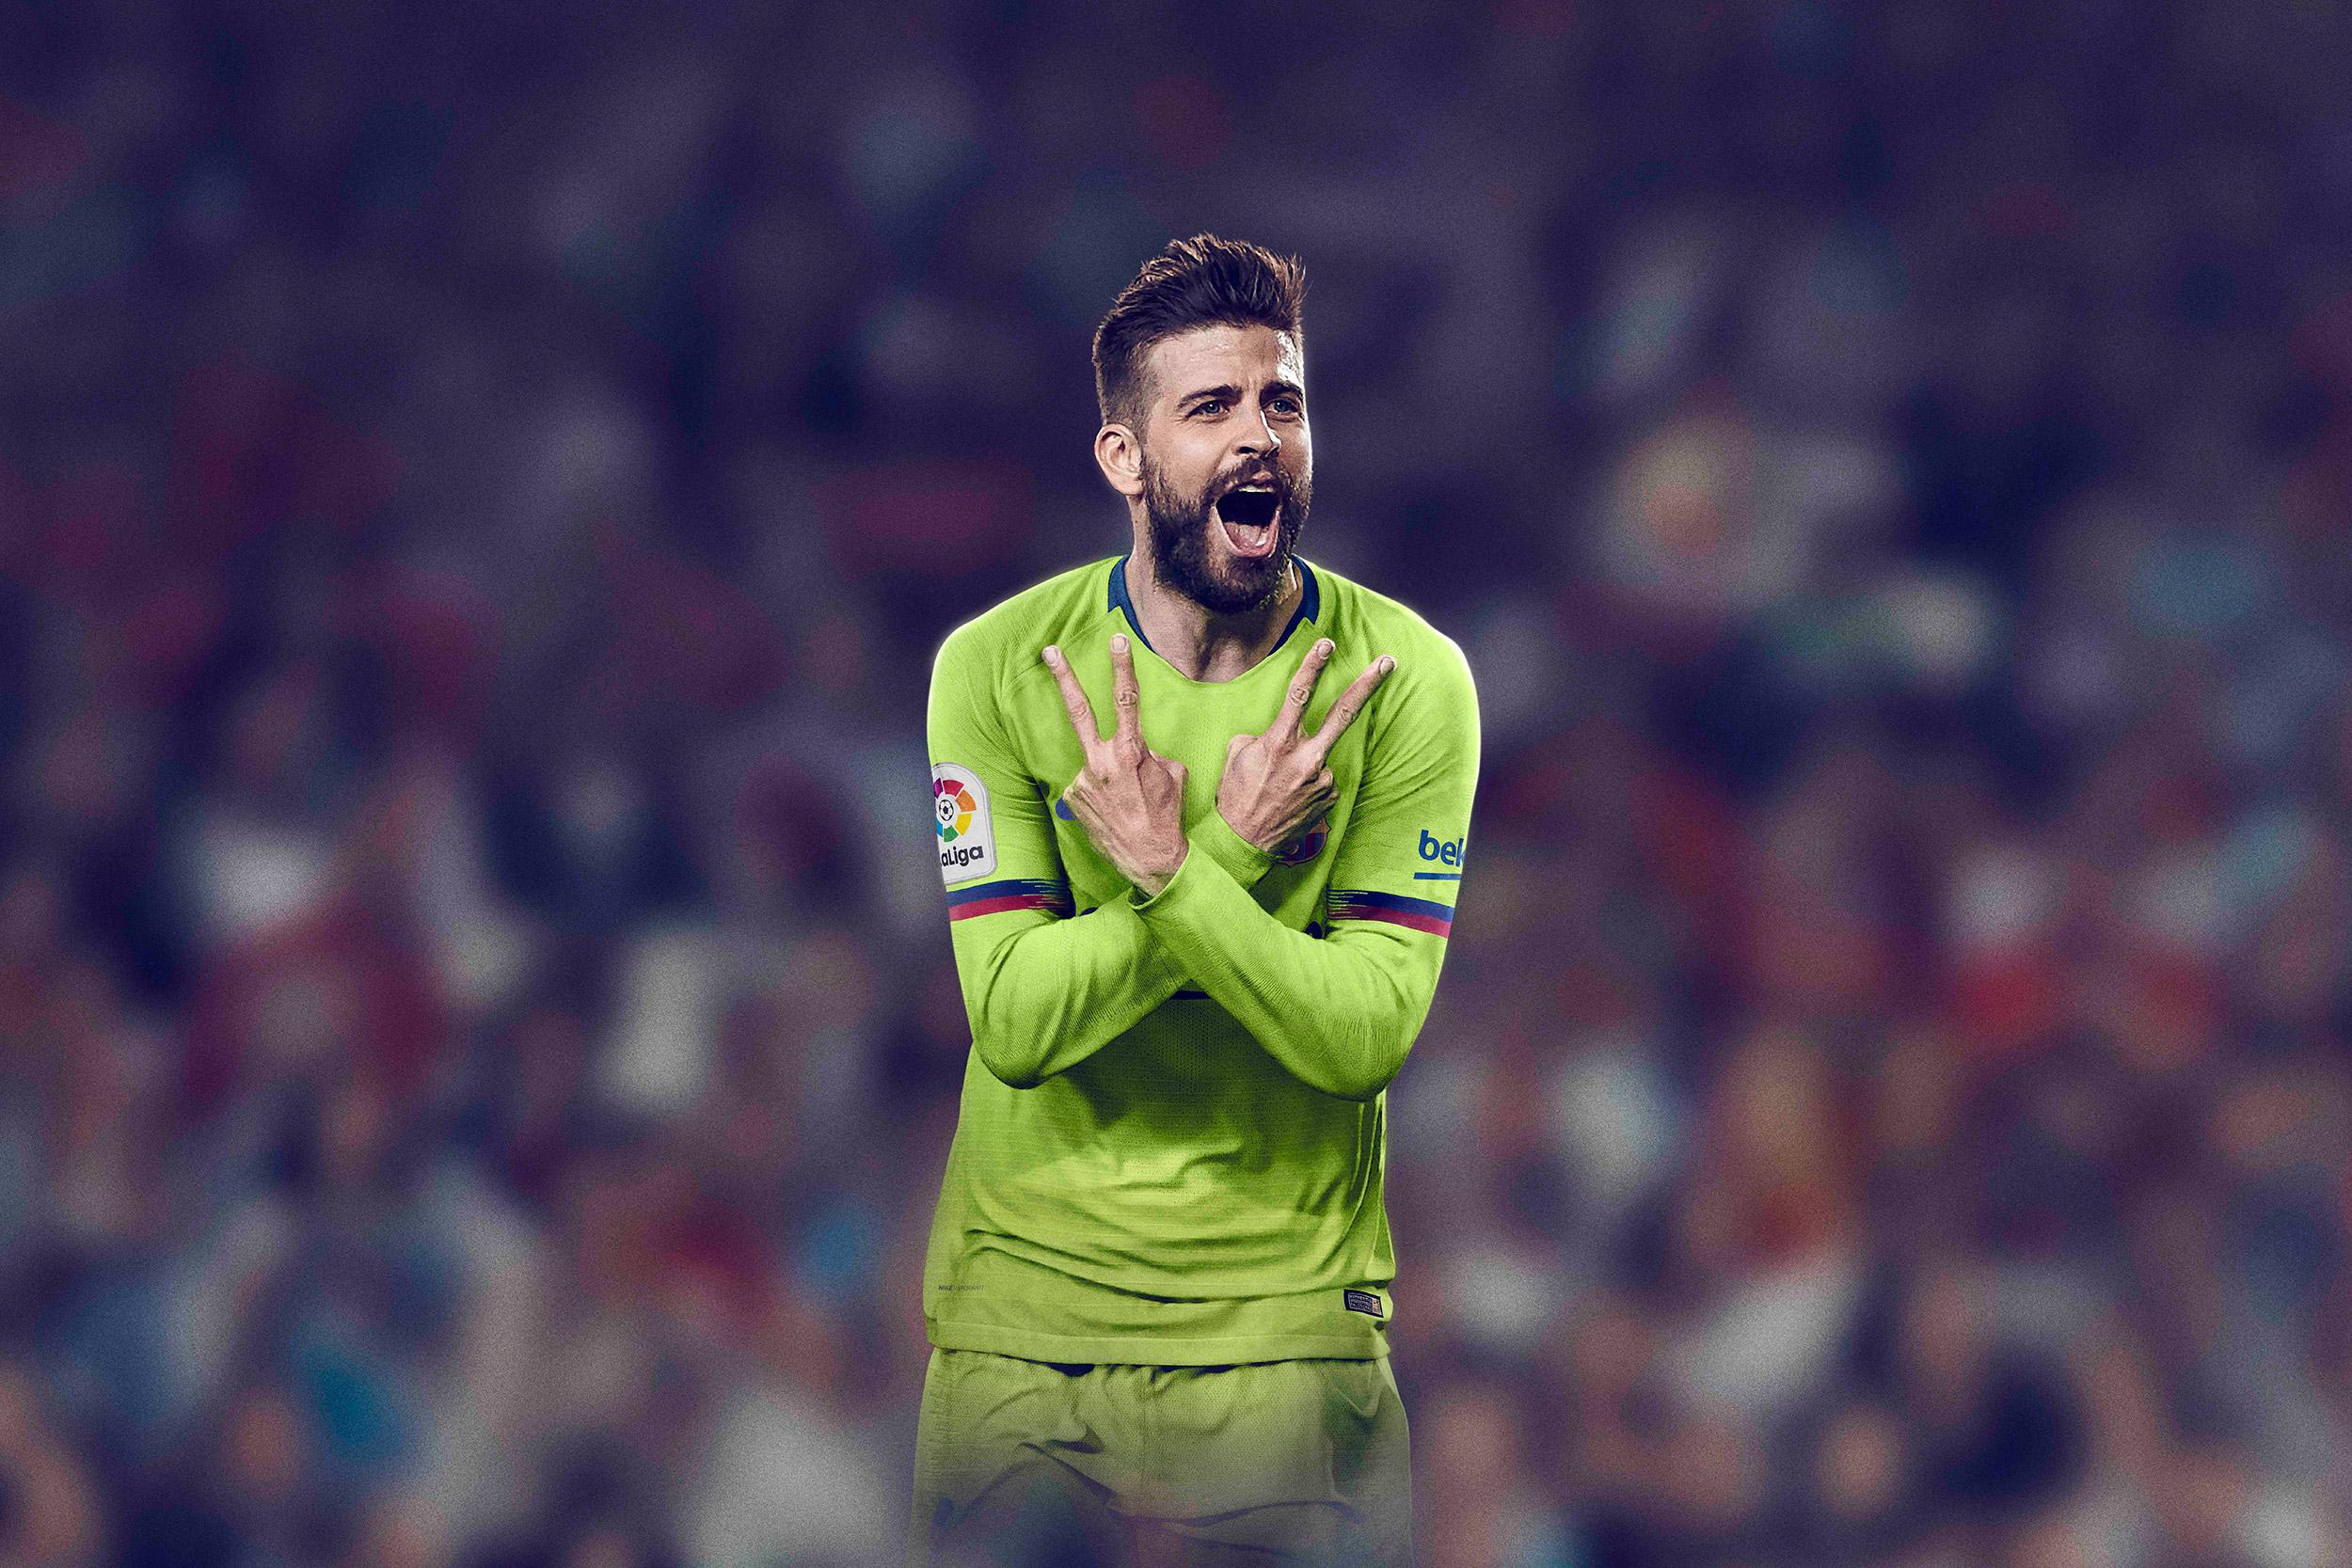 FC_Barcelona_Away_Kit_2018-19-3_80474